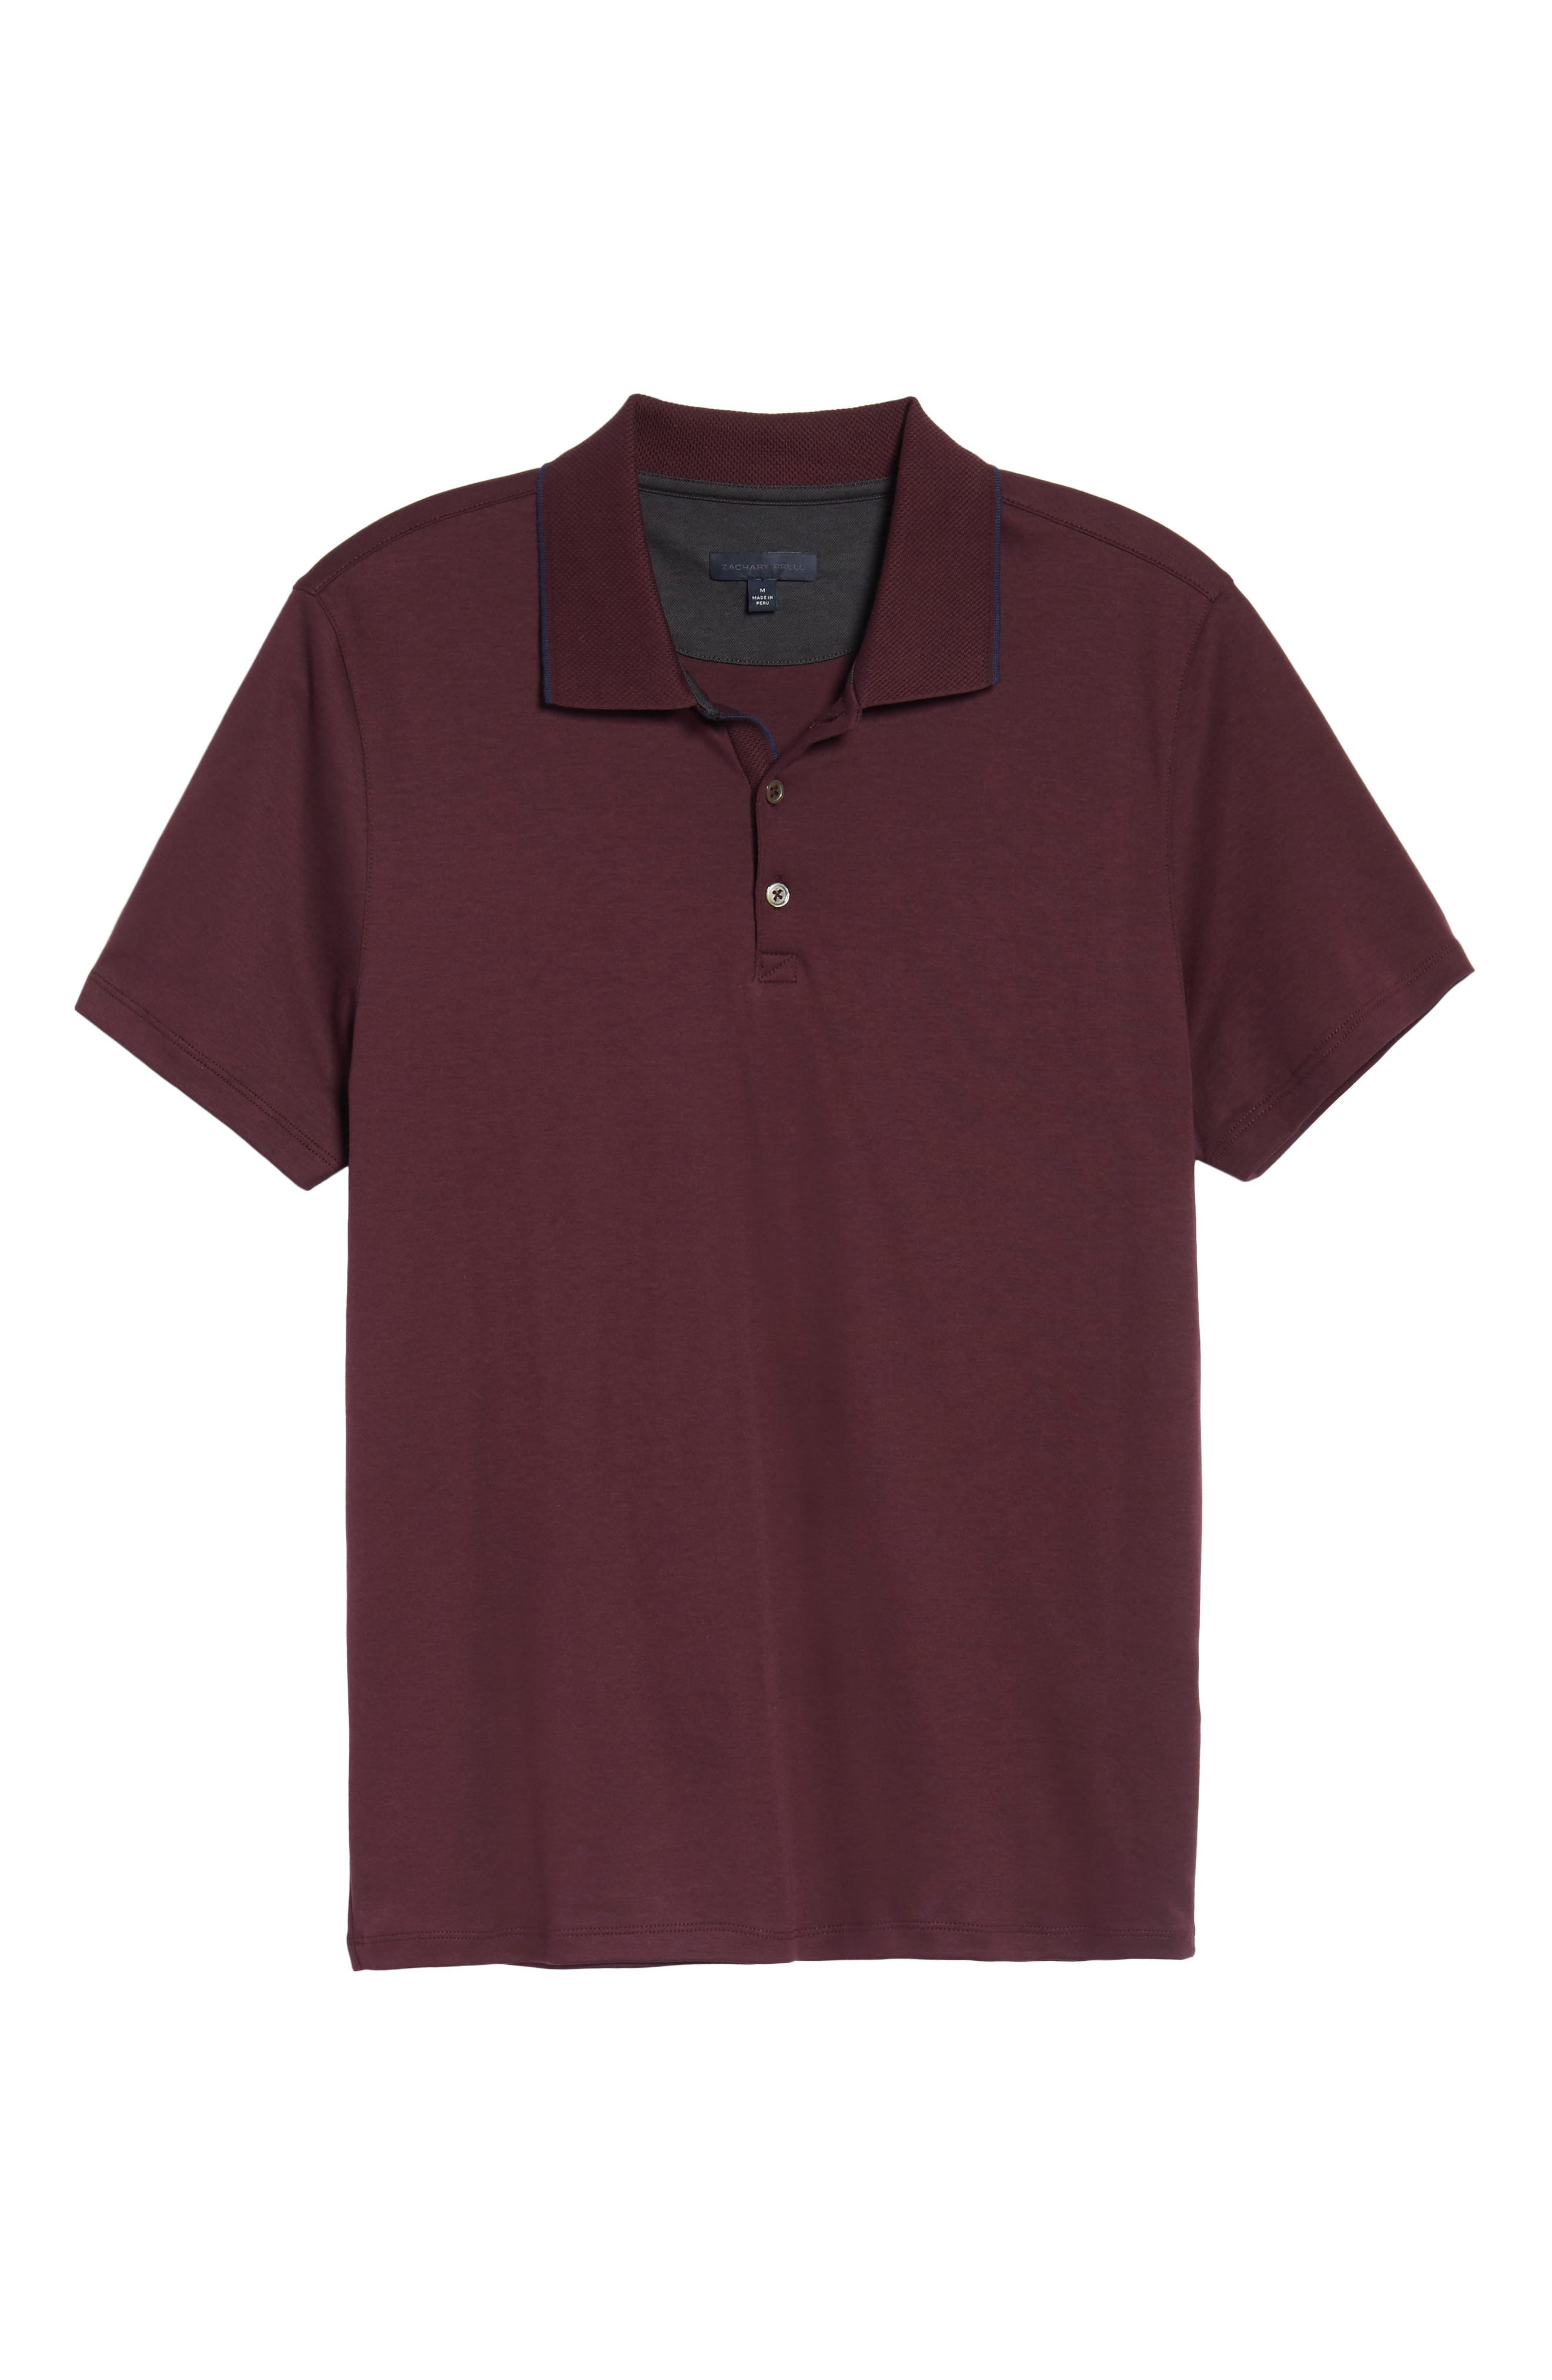 Grindstone Slim Fit Polo,                             Alternate thumbnail 6, color,                             Burgundy